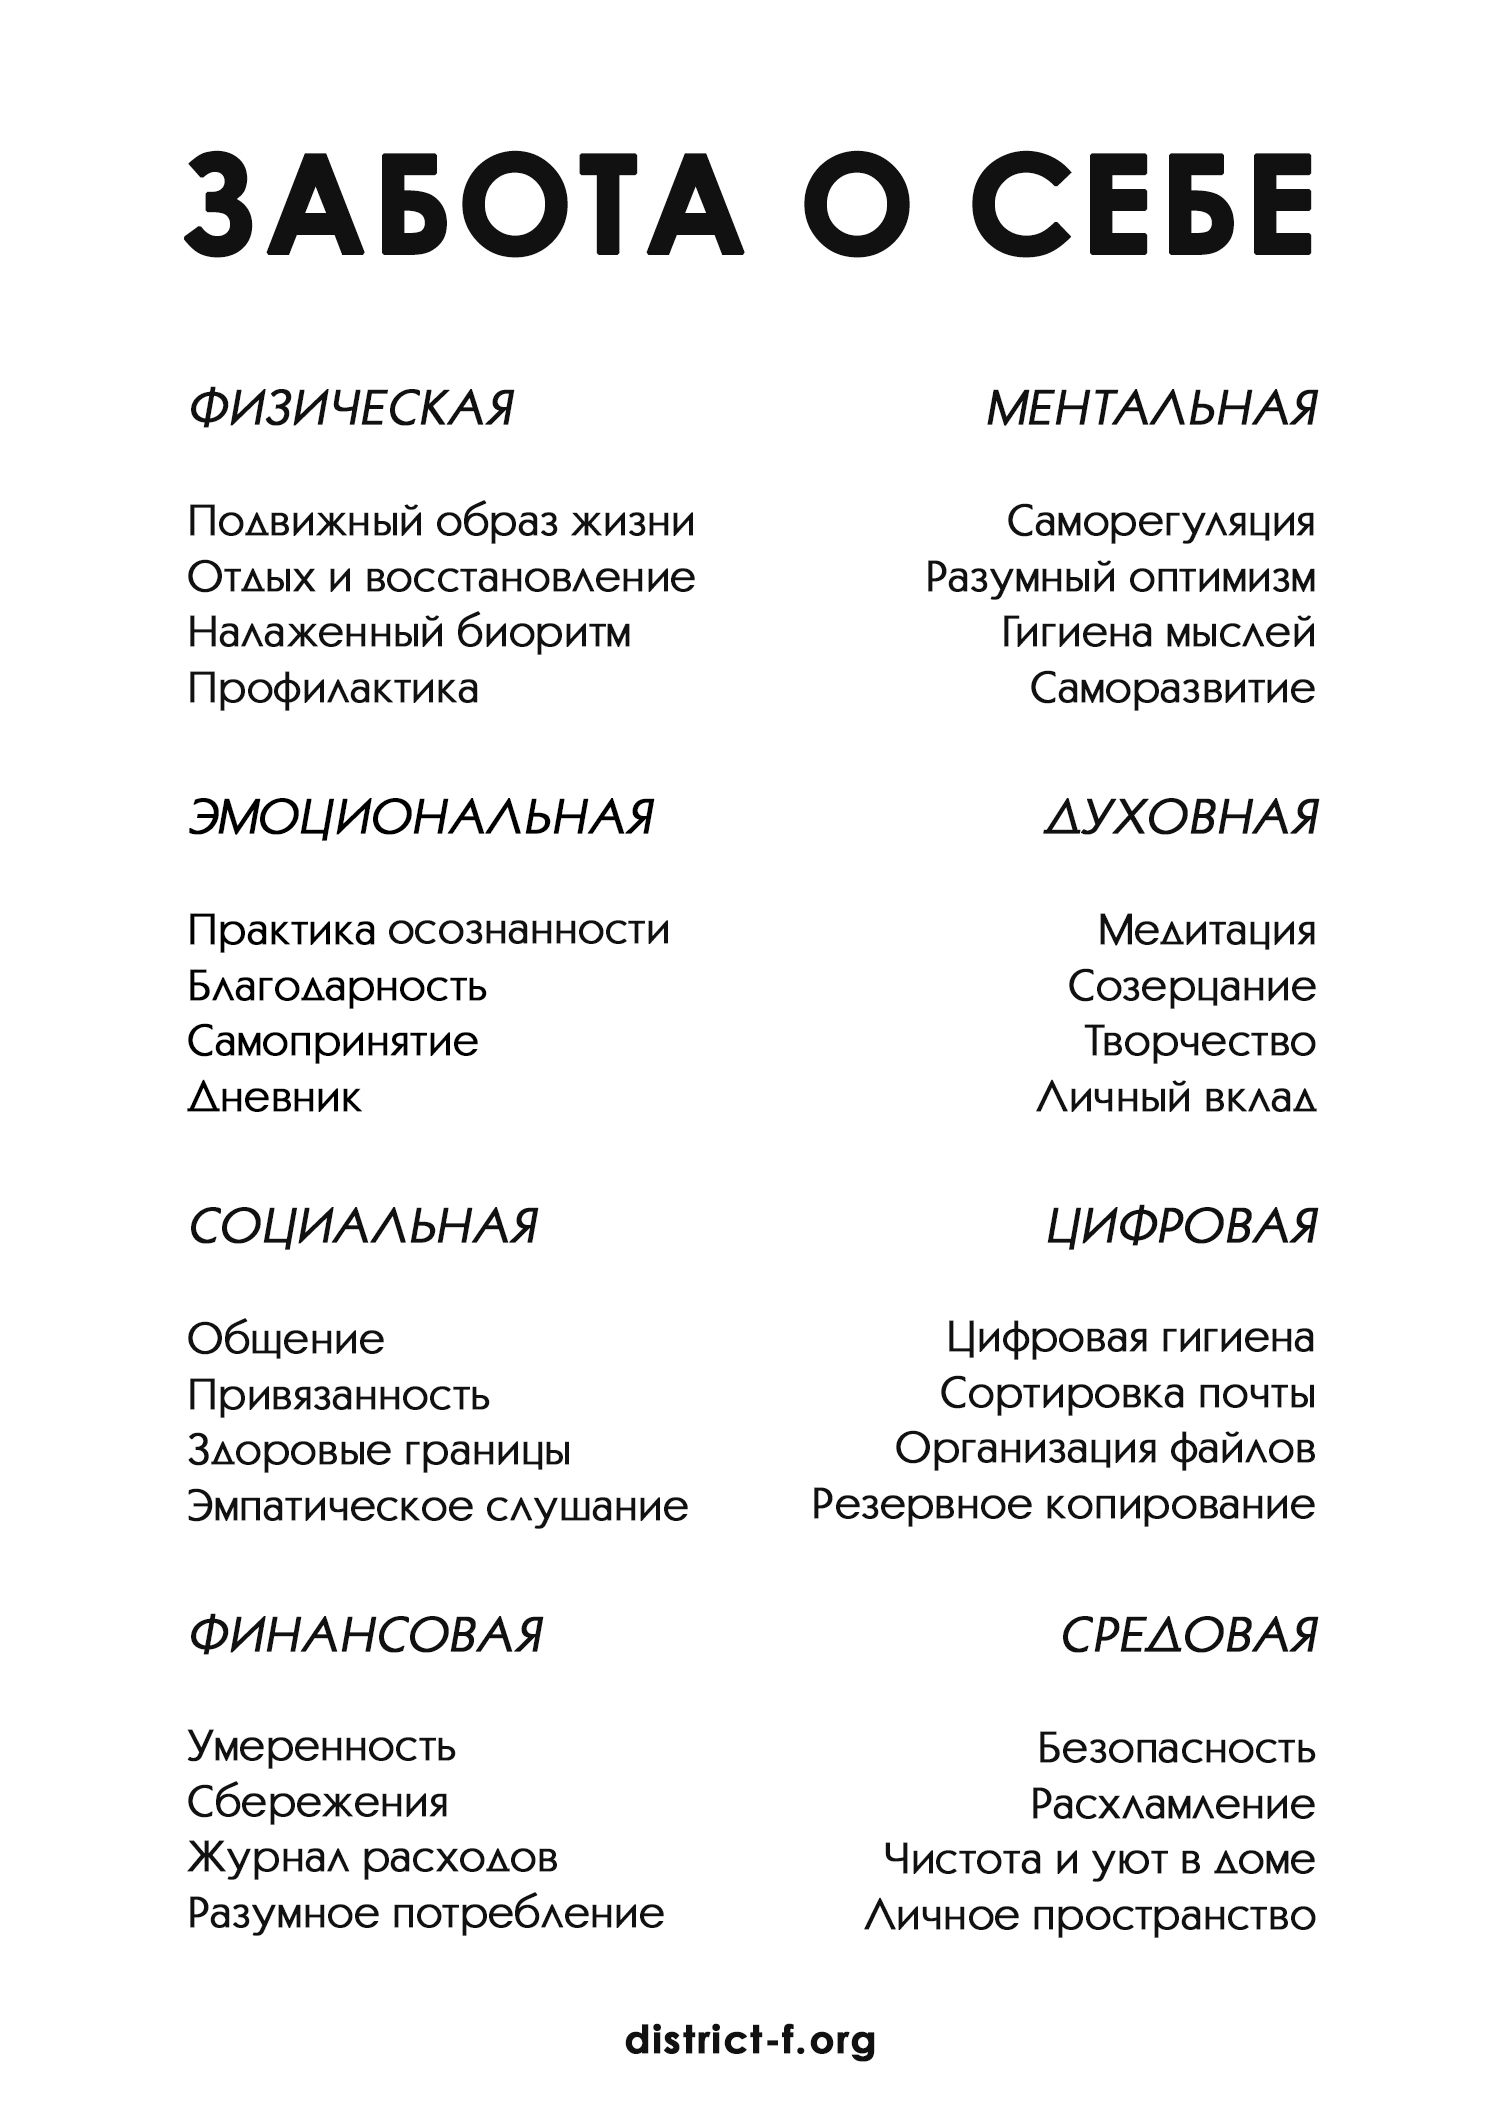 ИДЕИ ЗАБОТЫ О СЕБЕ SELFCARE DISTRICT F 2 df